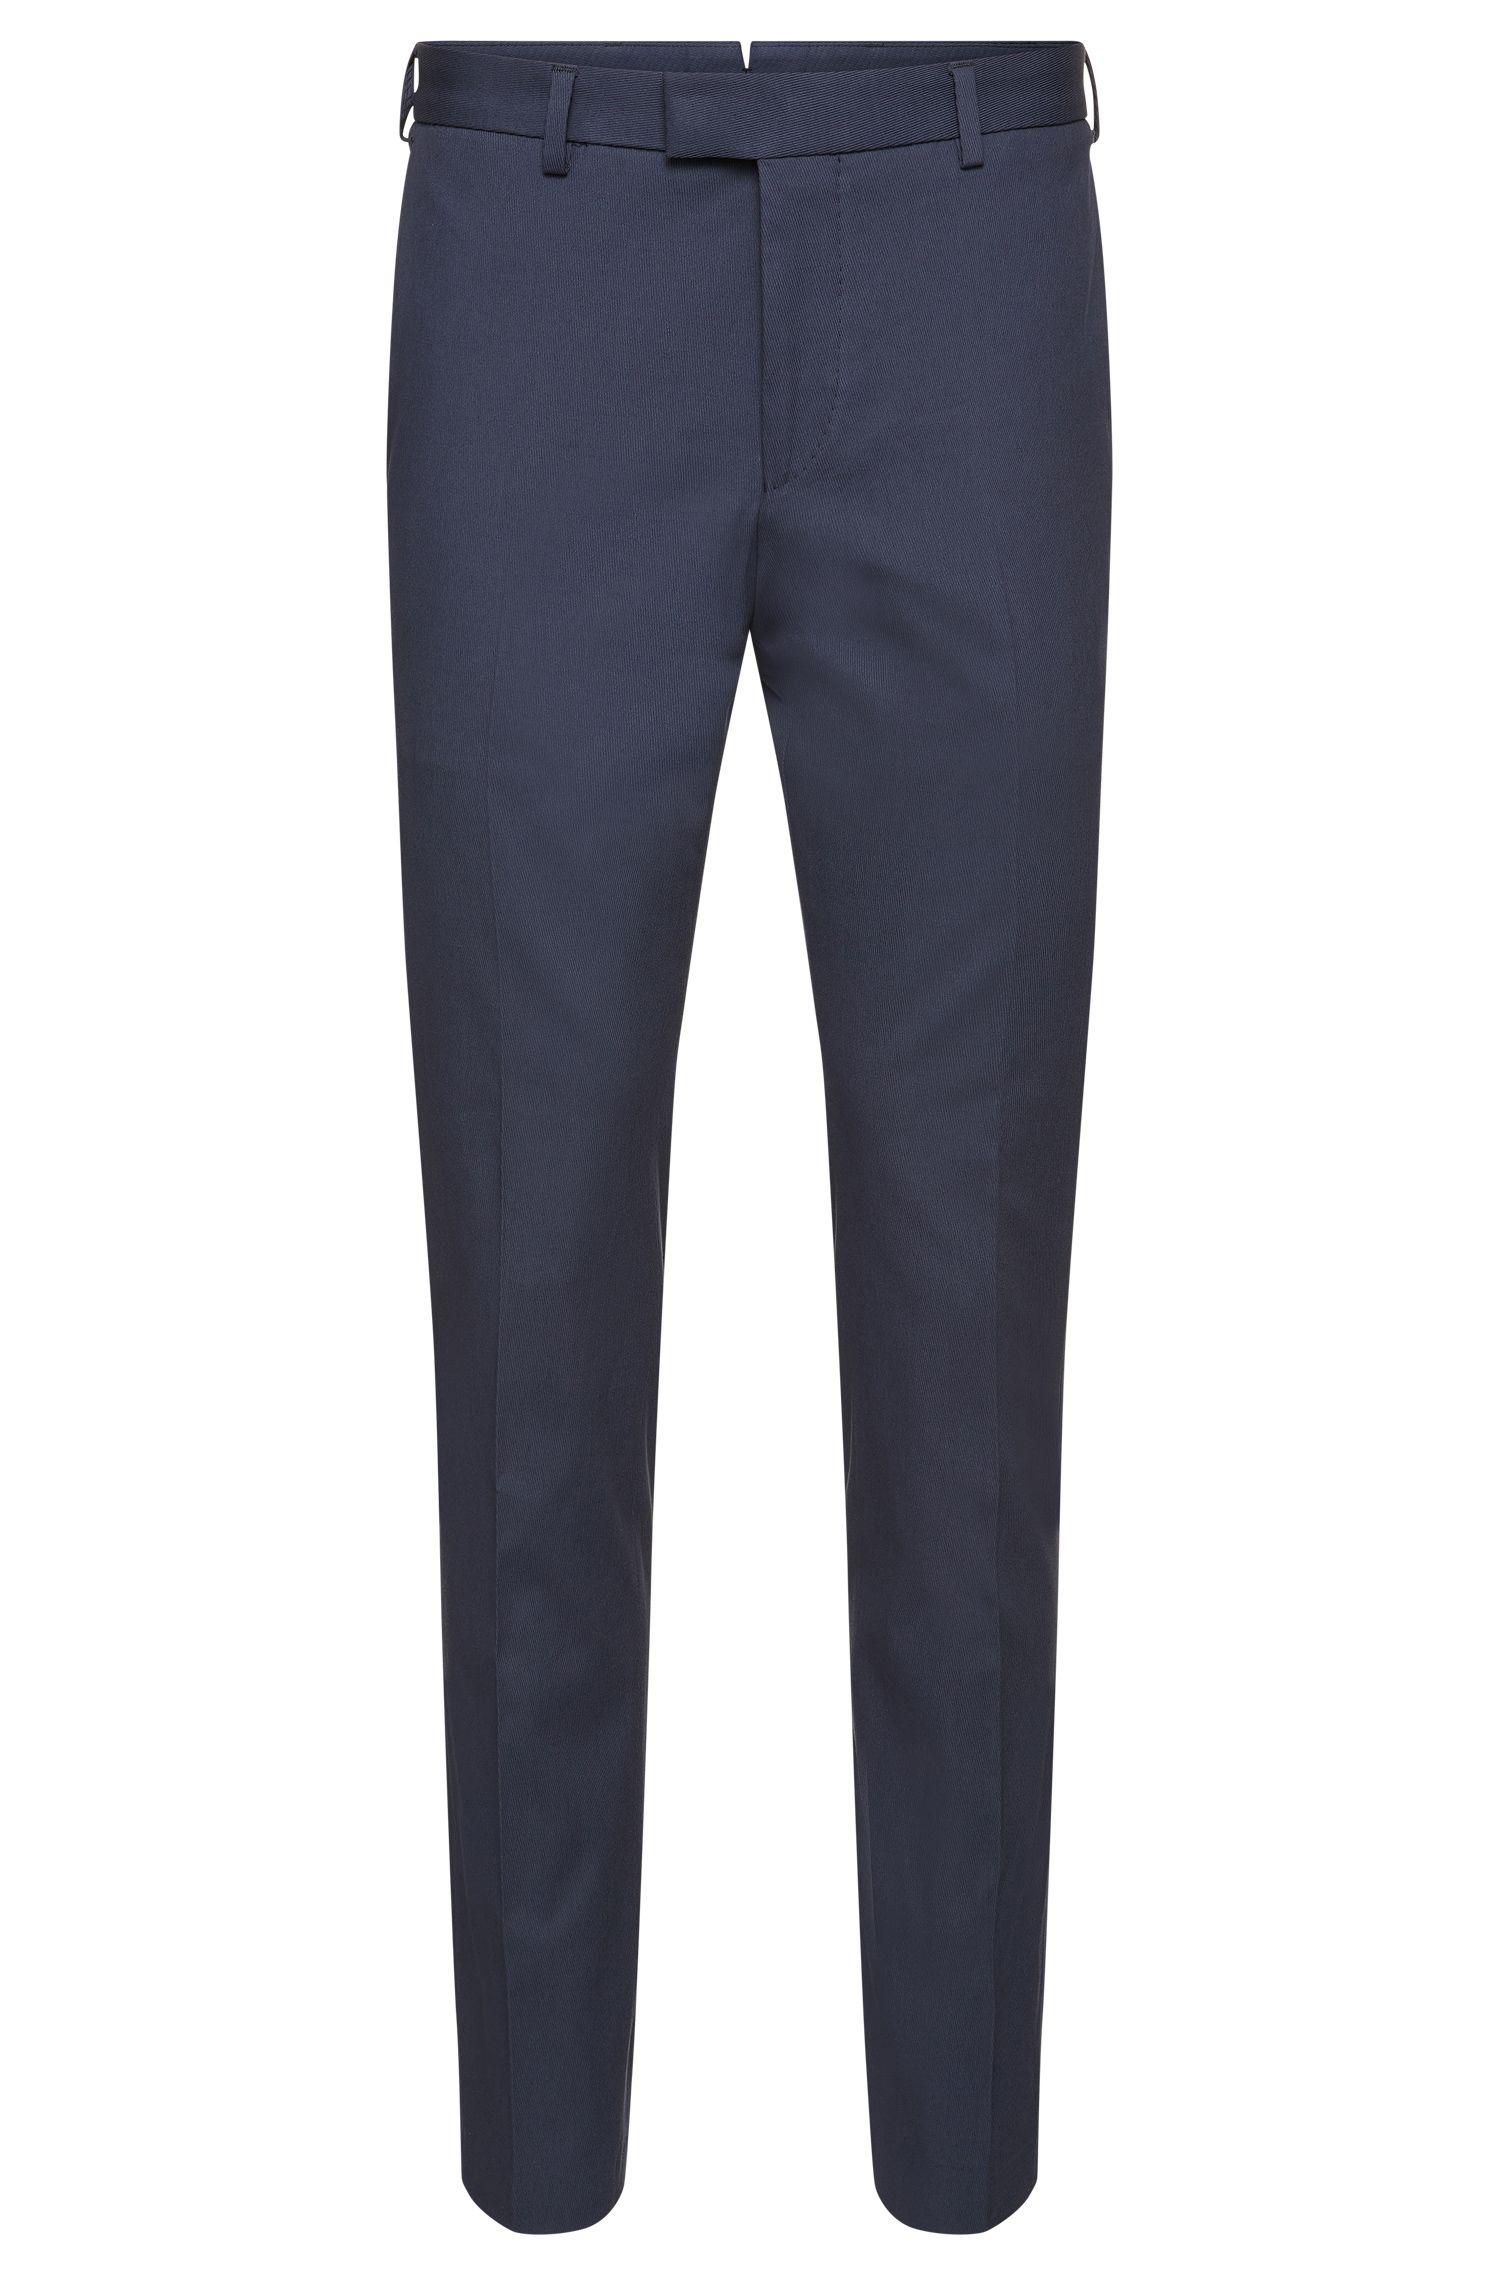 'T-Bak' | Slim Fit, Italian Stretch Cotton Dress Pants